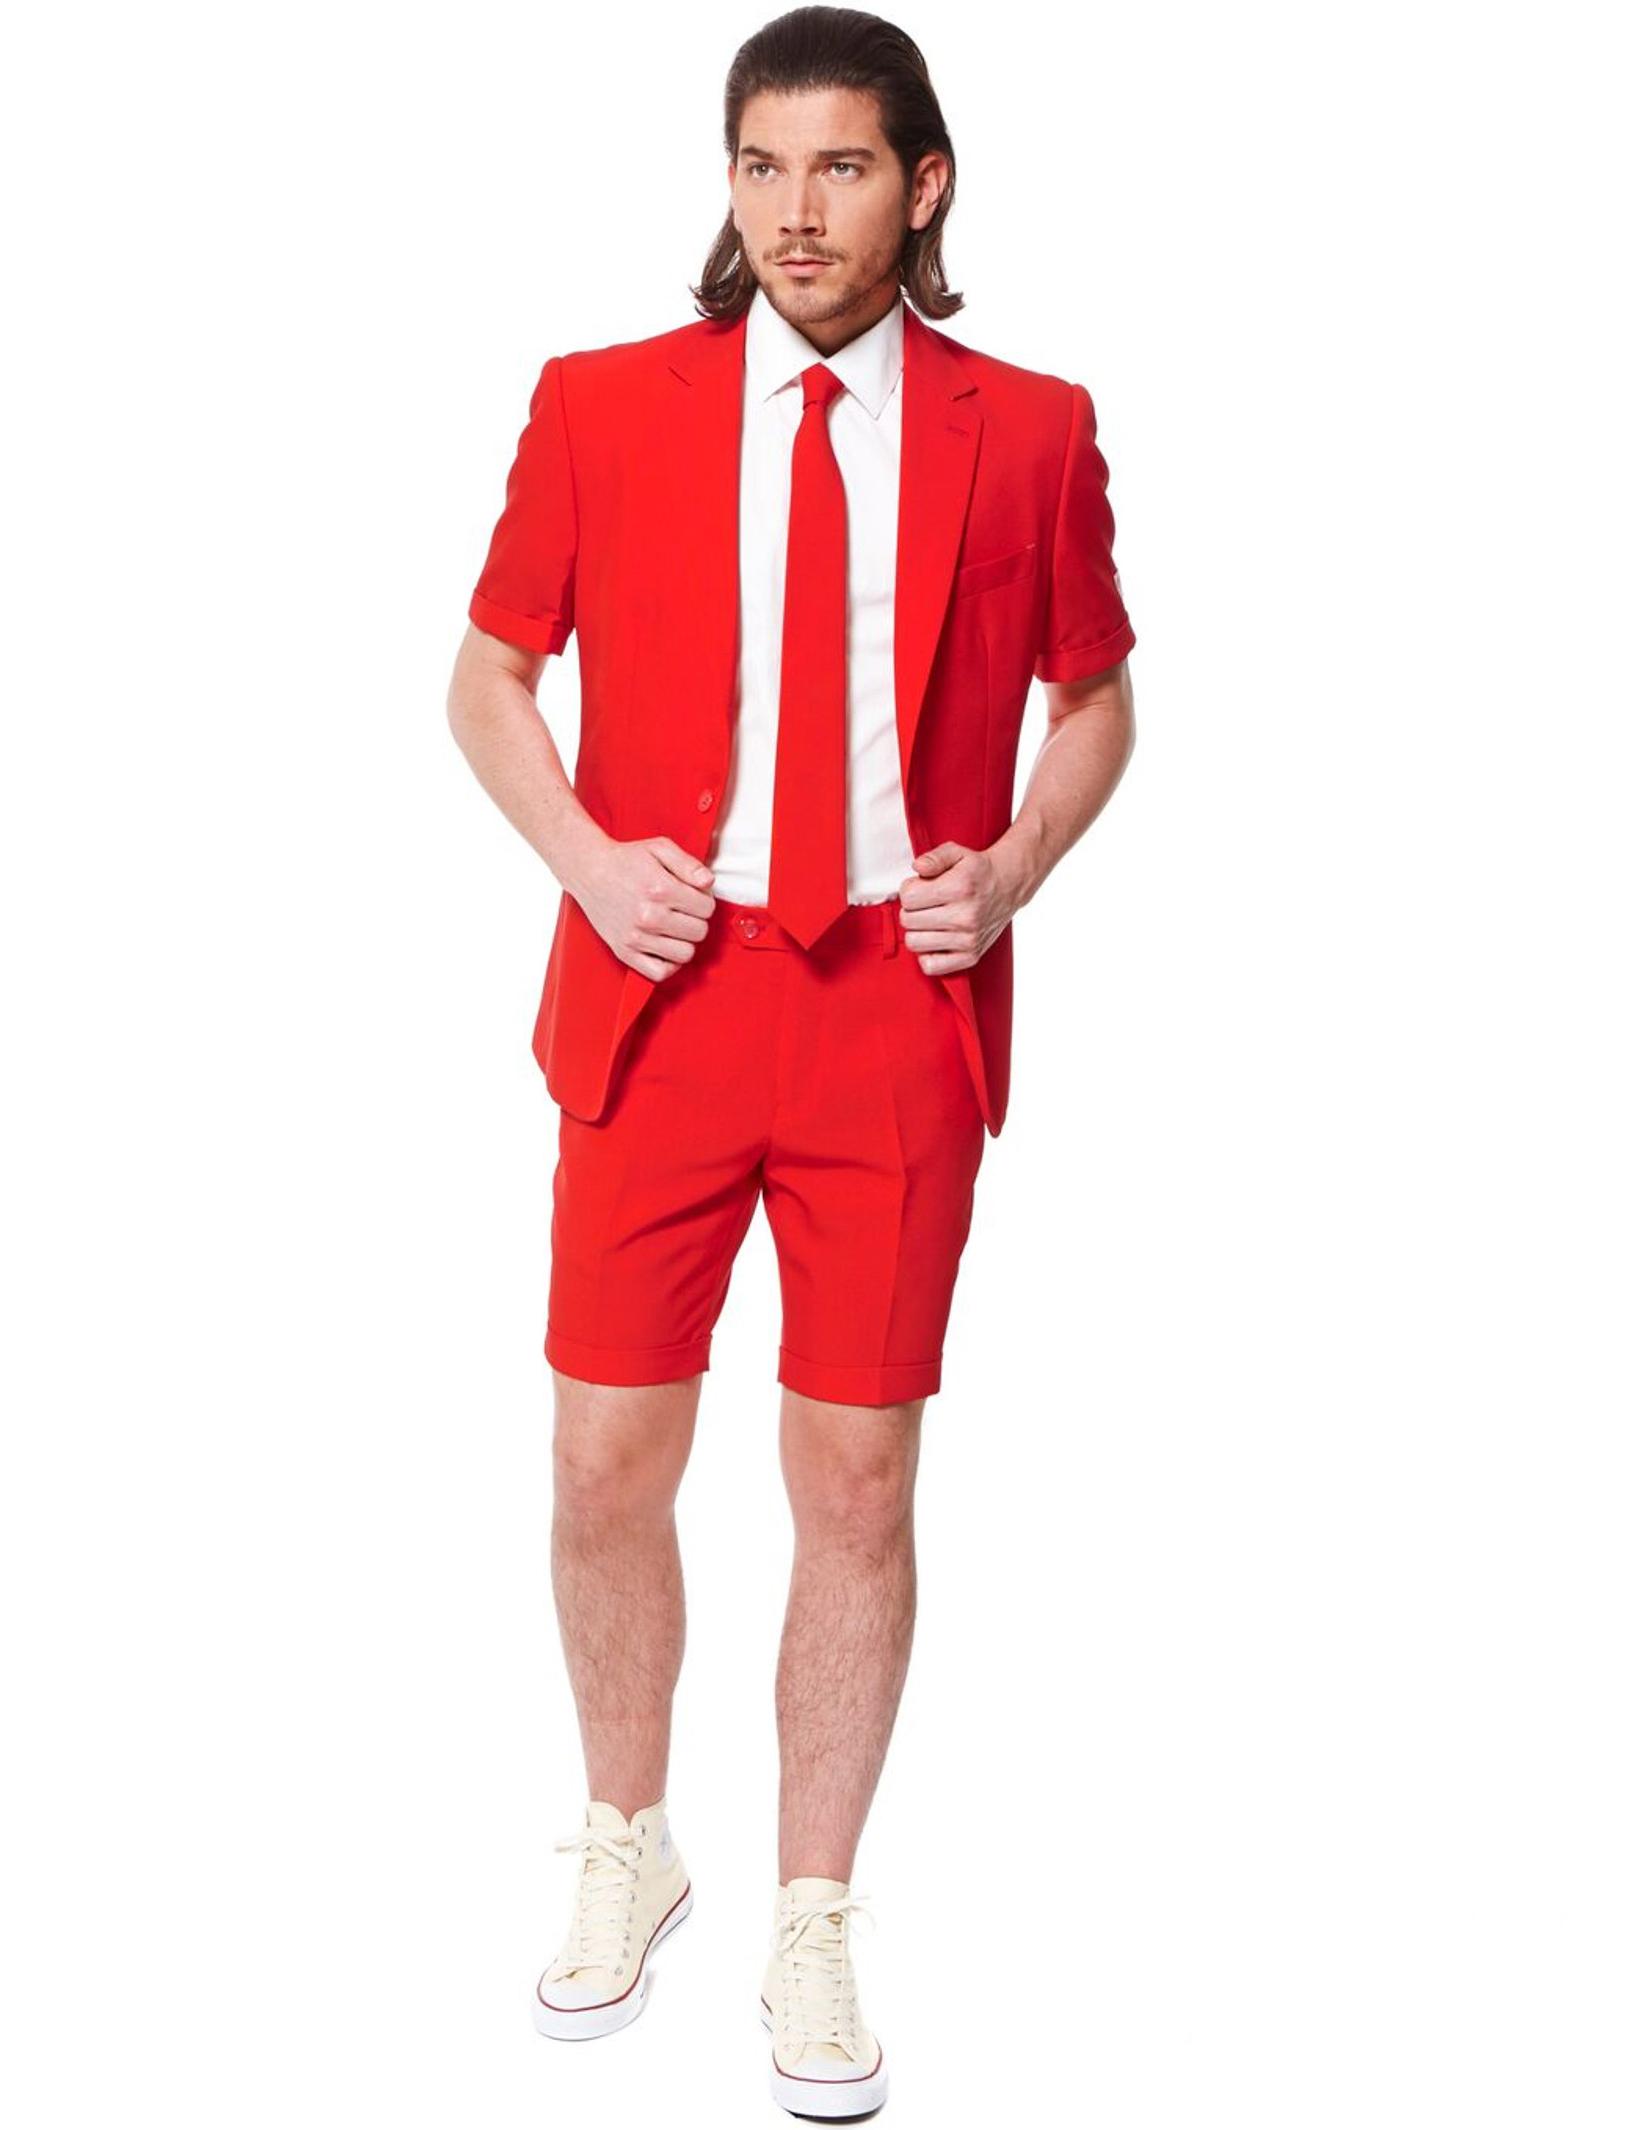 costume d 39 t mr rouge homme opposuits deguise toi. Black Bedroom Furniture Sets. Home Design Ideas